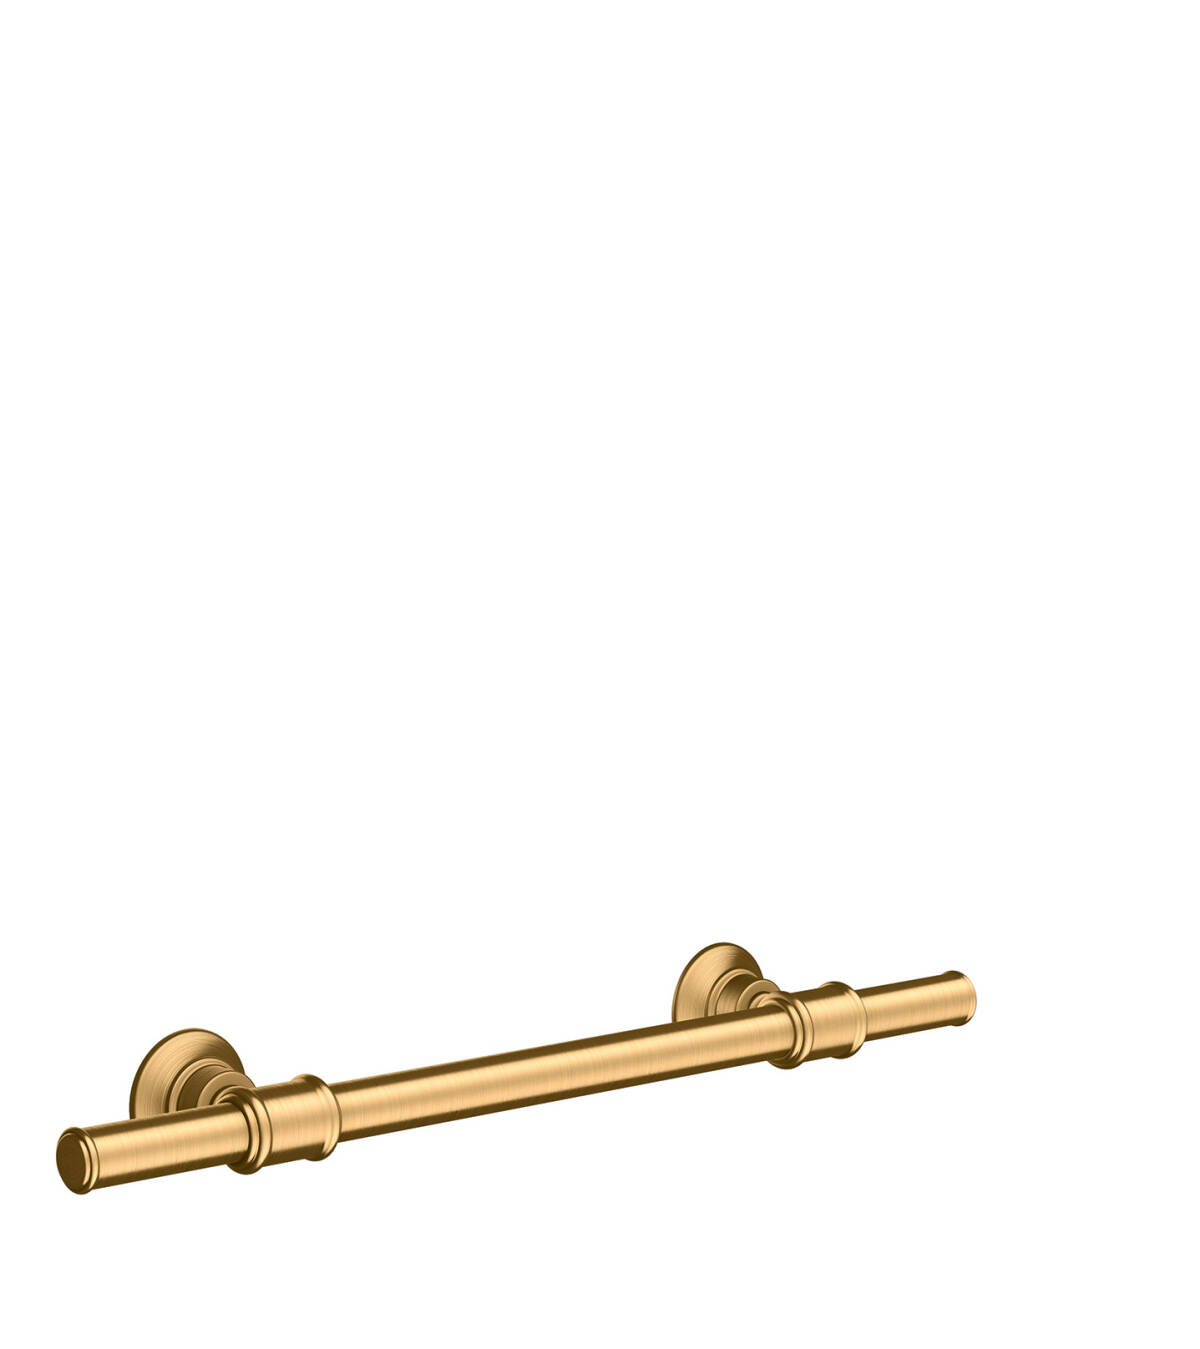 Rail / Asidero, latón cepillado, 42030950